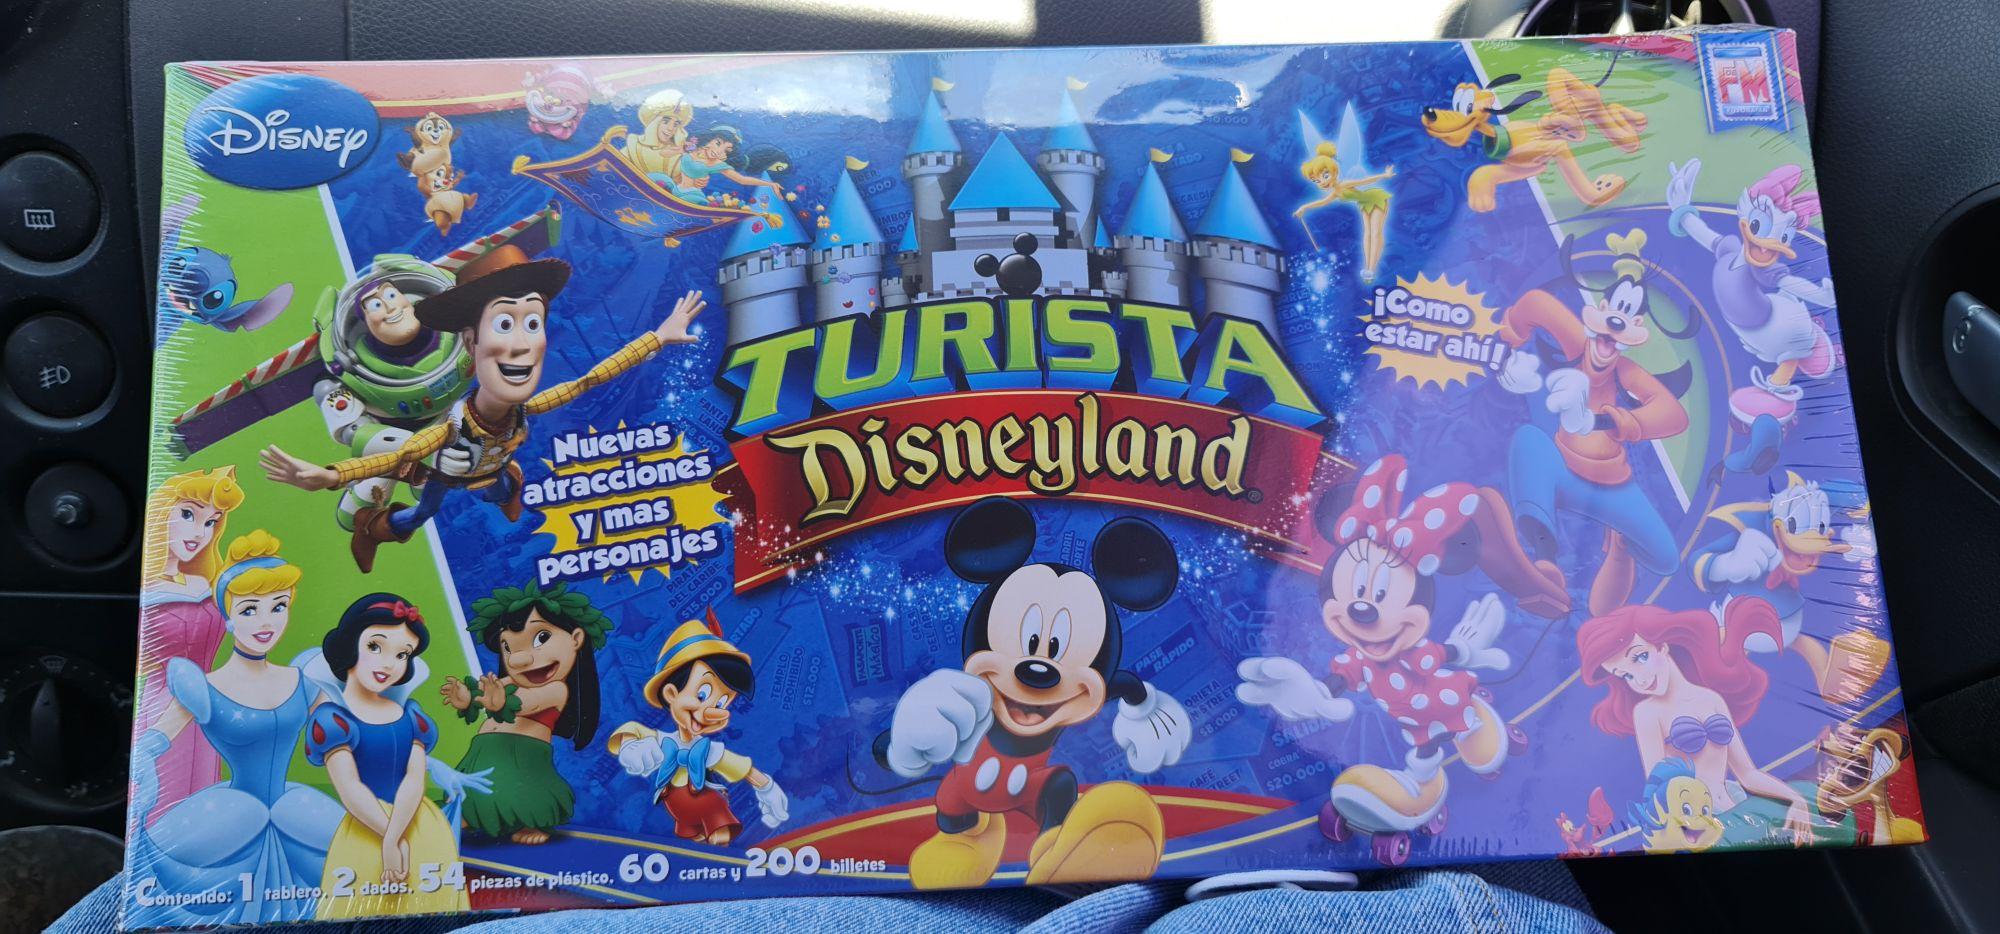 Walmart: Turista Disneyland